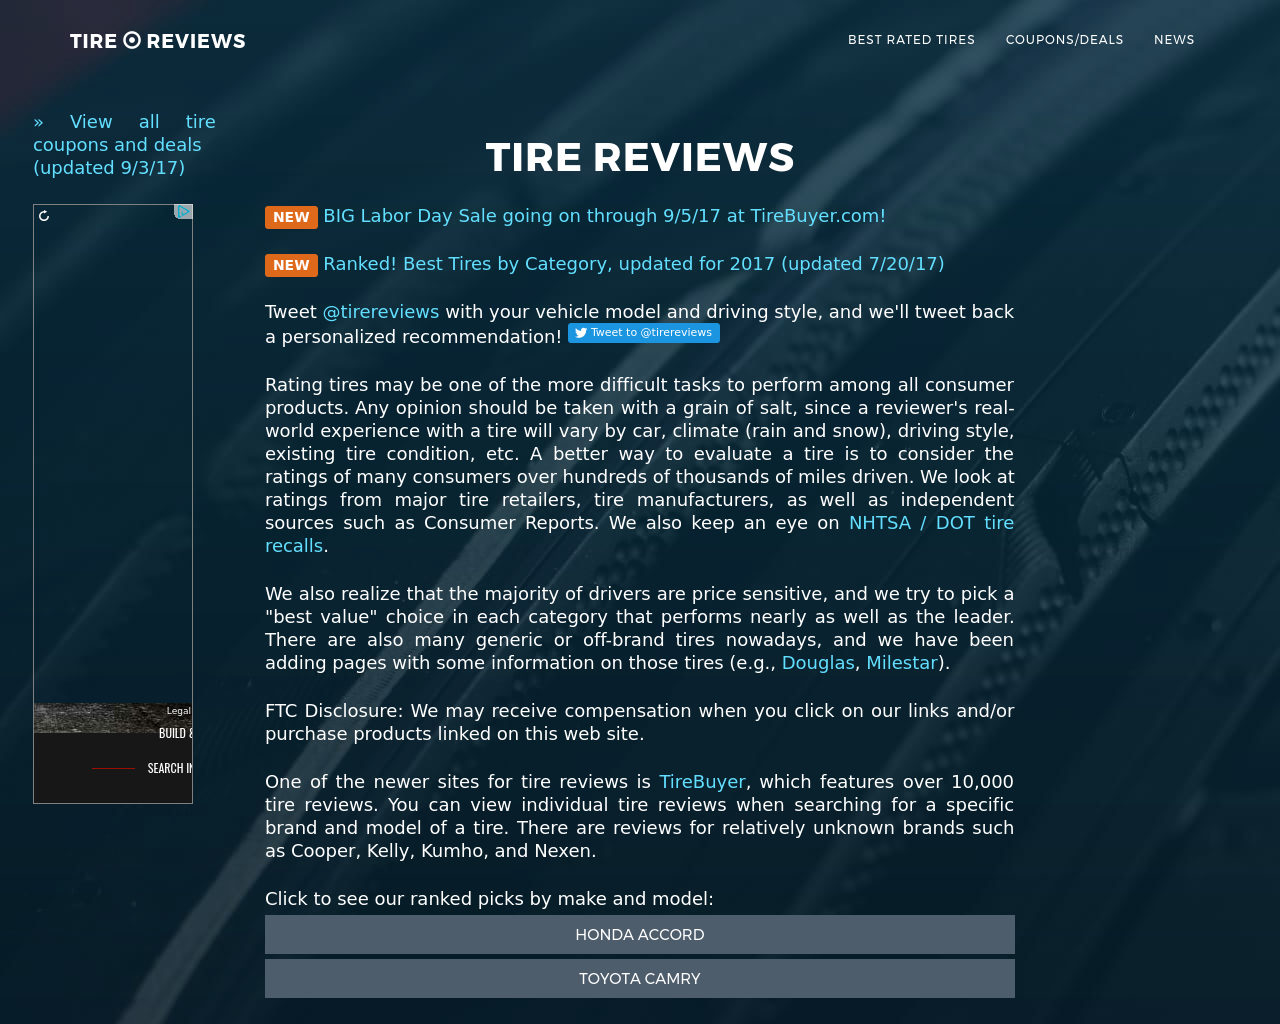 Tire-Reviews-Advertising-Reviews-Pricing